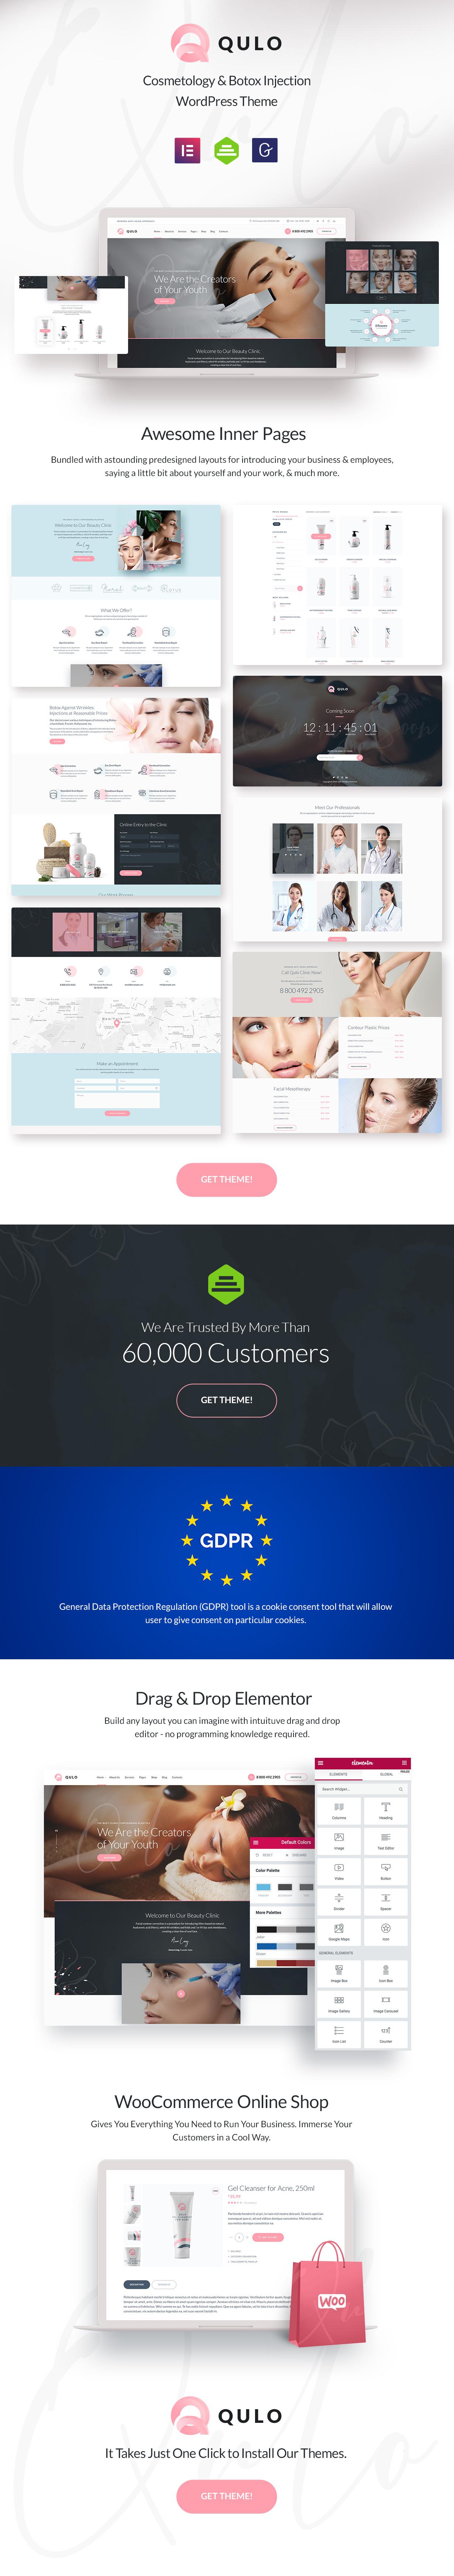 Qulo - Cosmetology and Botox Injection WordPress Theme - 1